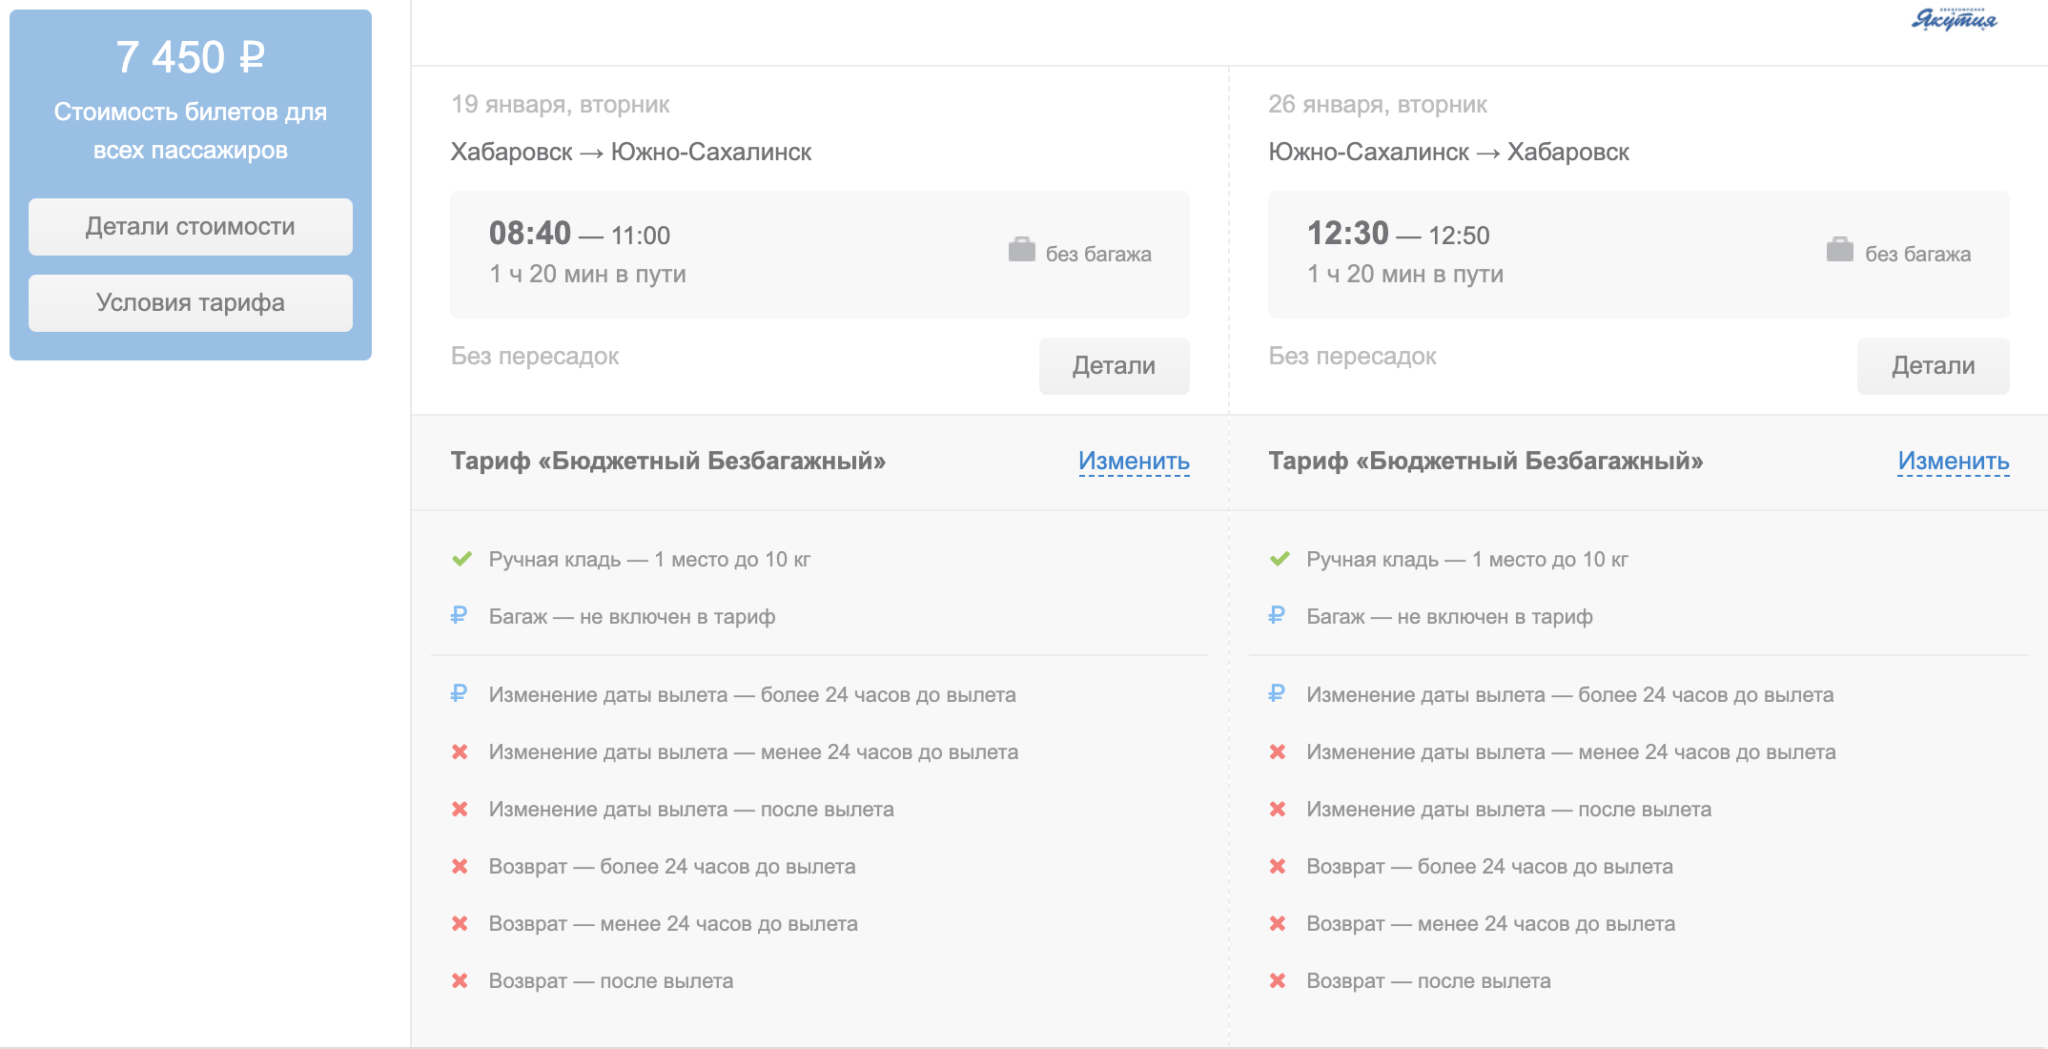 ЧП а/к Якутия: 35% скидки на все направления. Мск-Калининград и МинВоды за 2300₽, в Сочи за 2900₽ туда-обратно и др.